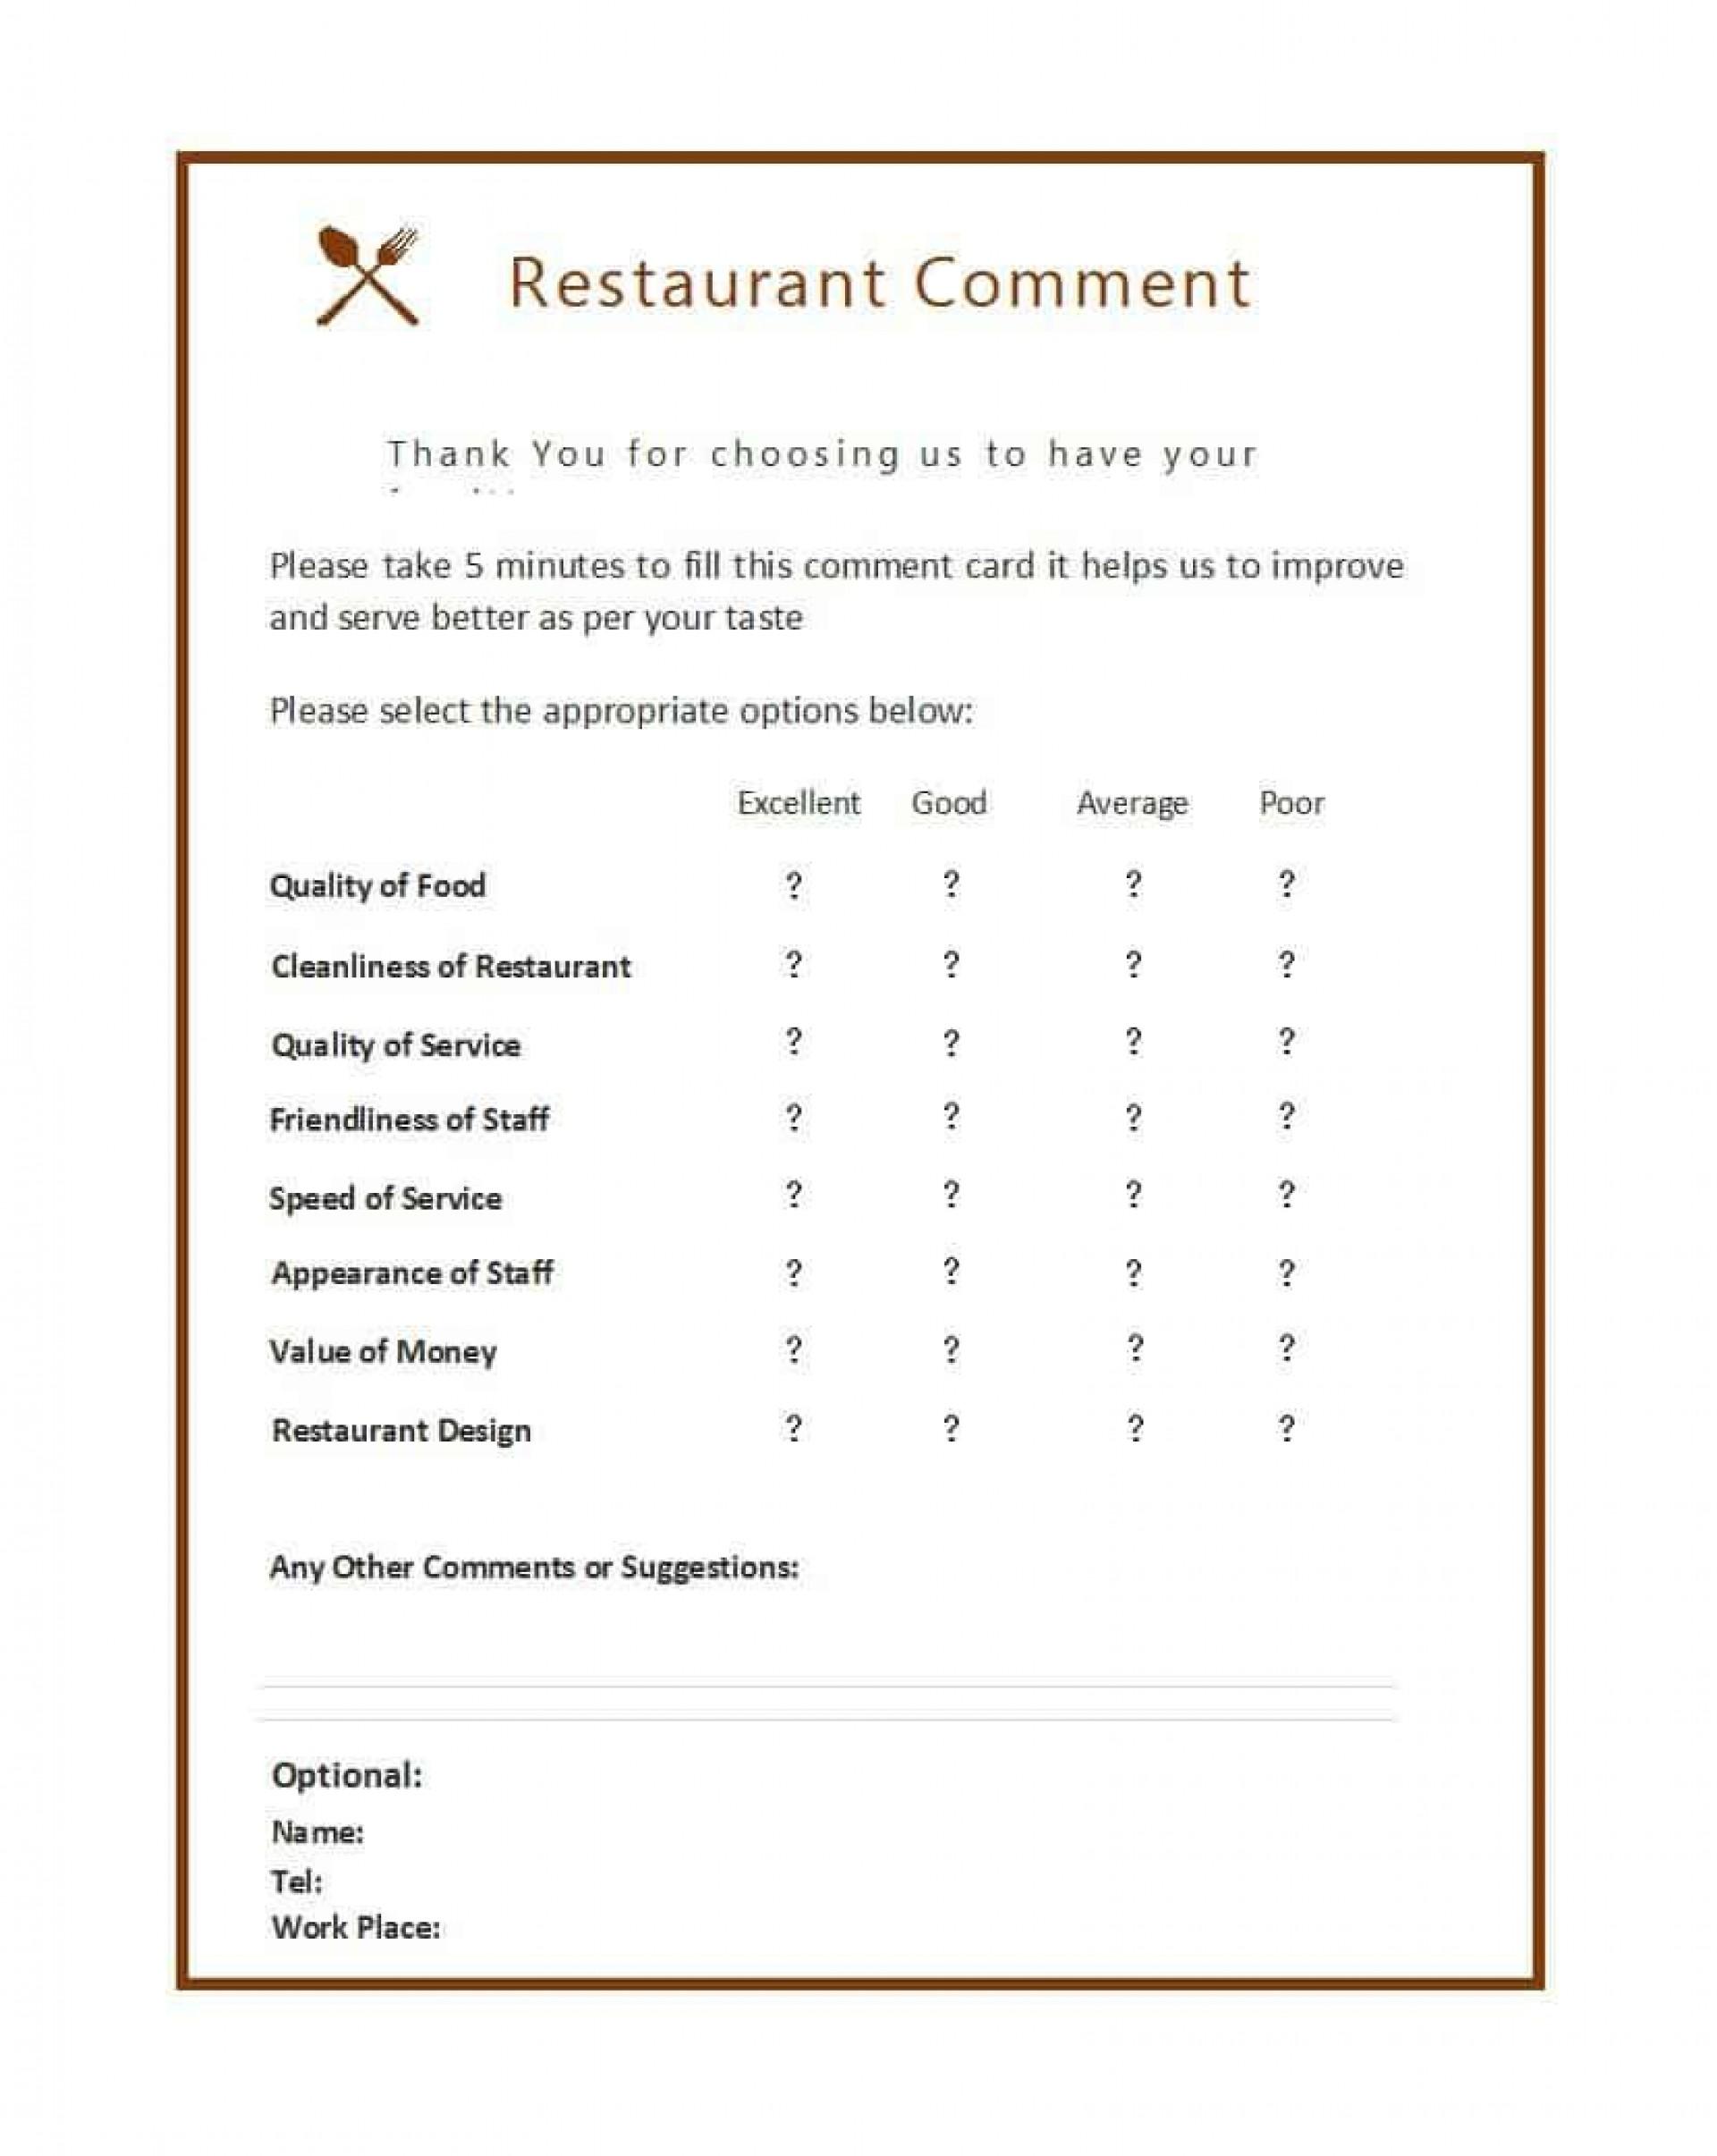 007 Singular Restaurant Comment Card Template For Word Design 1920